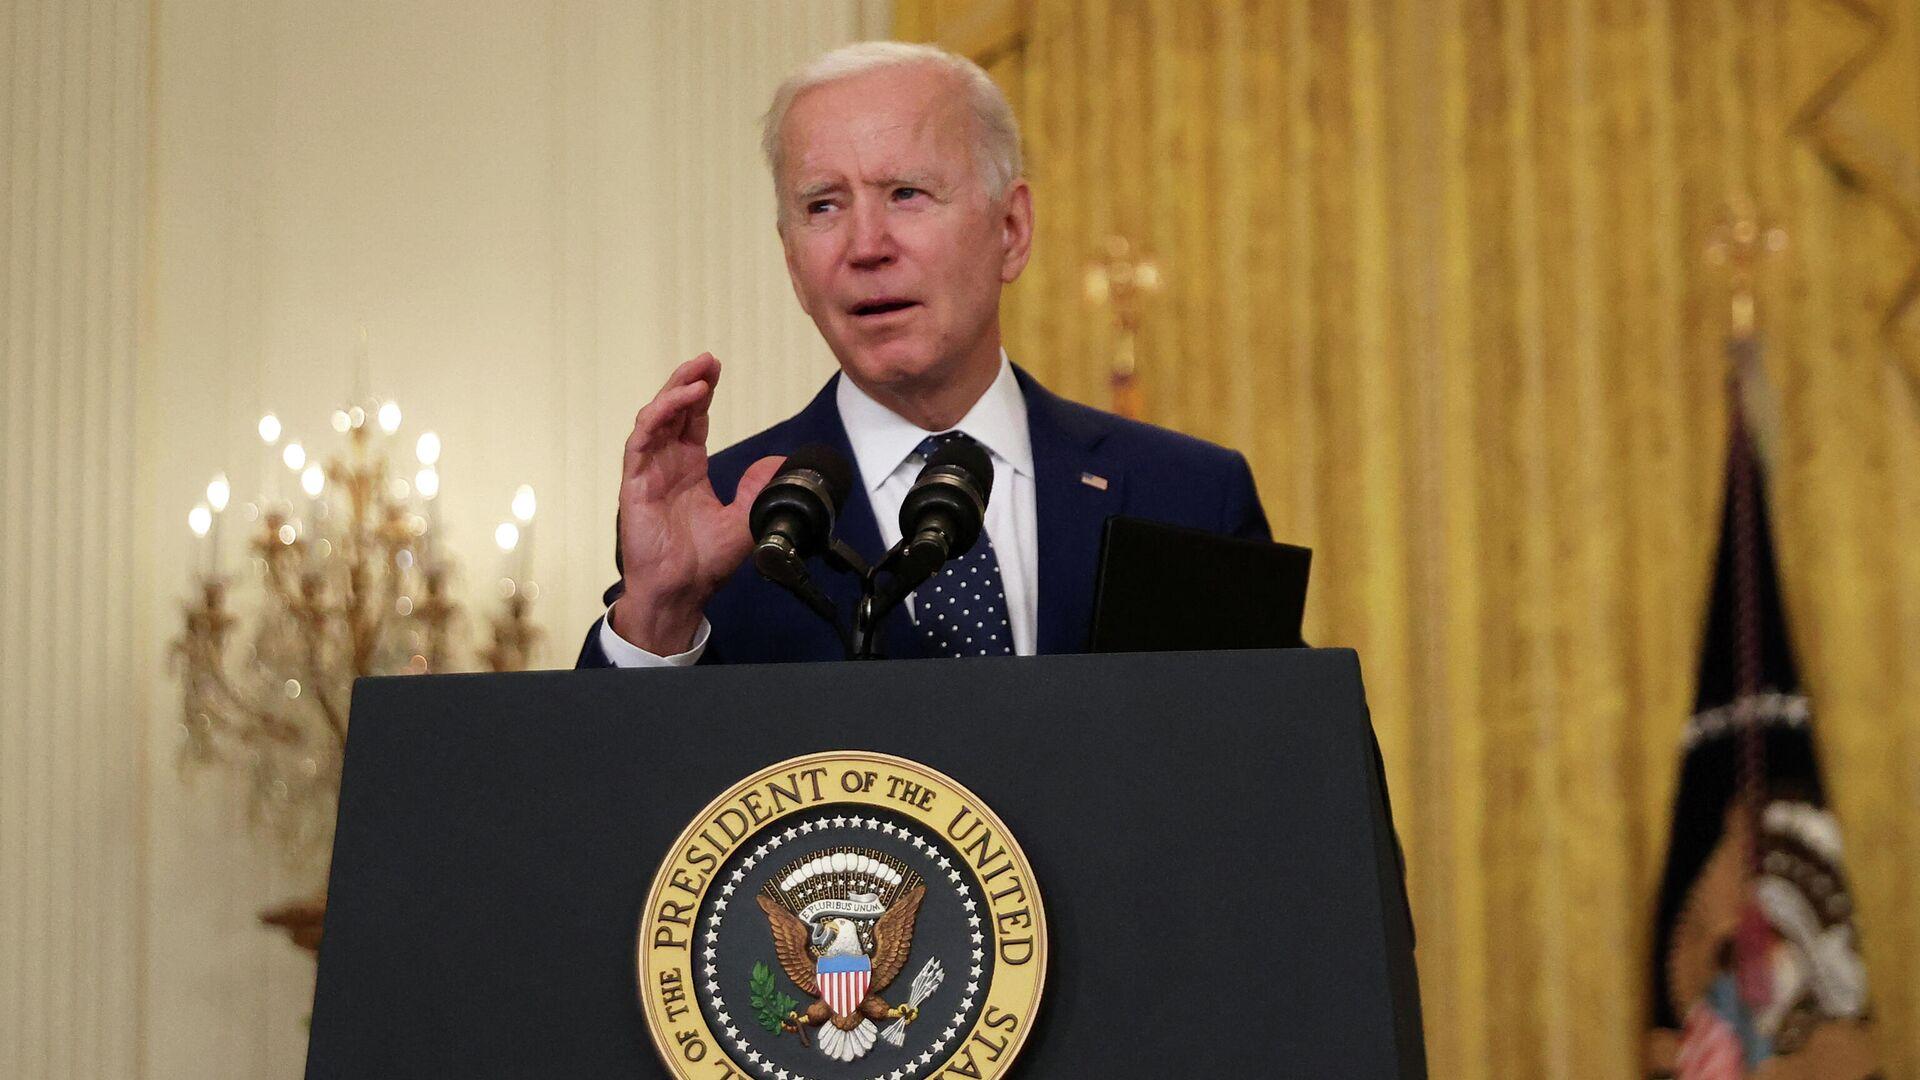 Joe Biden, presidente de EEUU - Sputnik Mundo, 1920, 30.04.2021